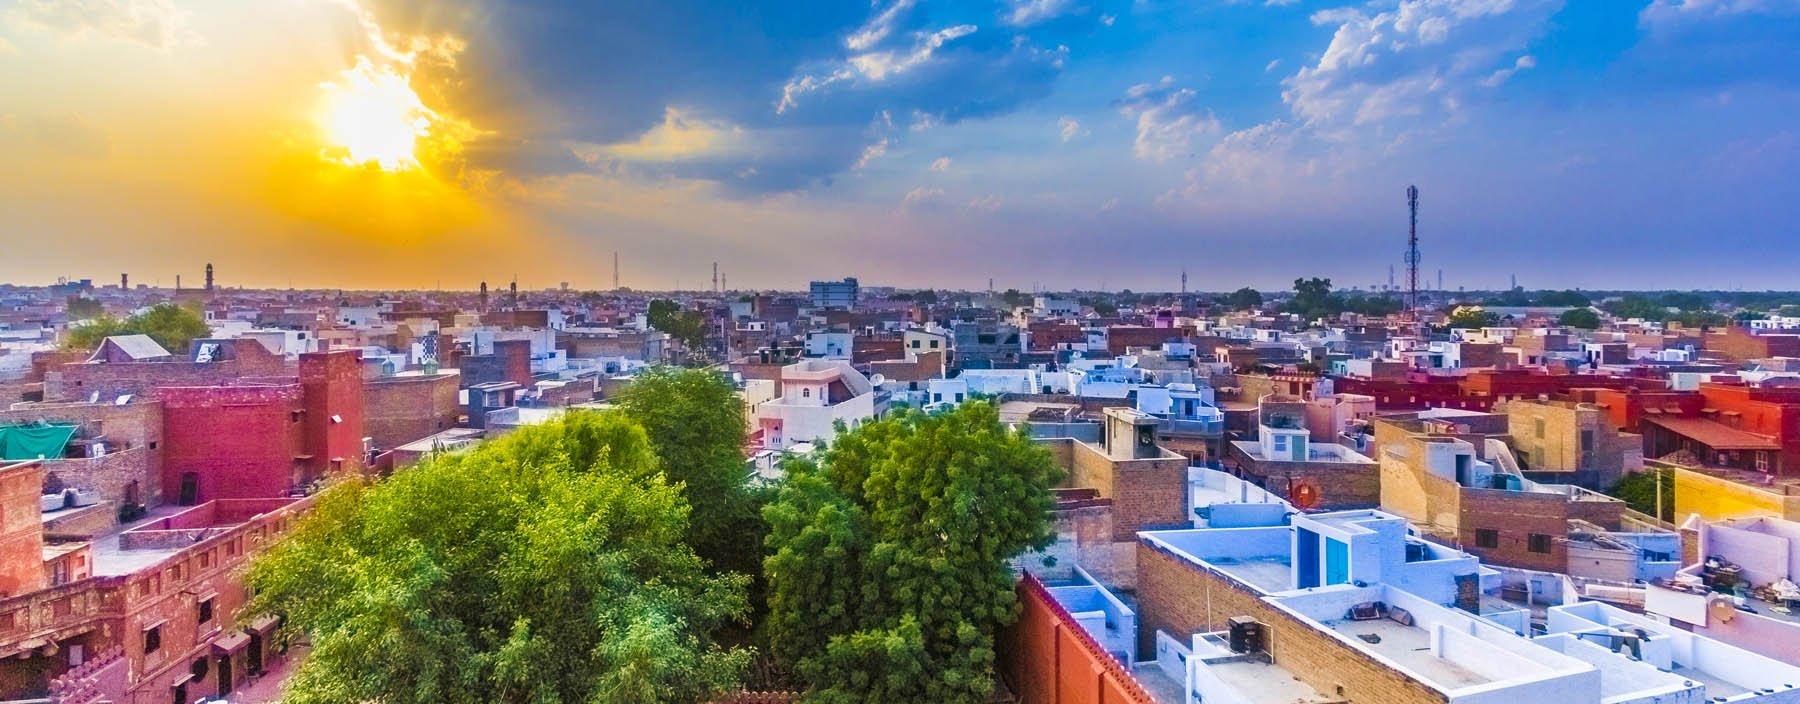 in, bikaner, cityscape.jpg